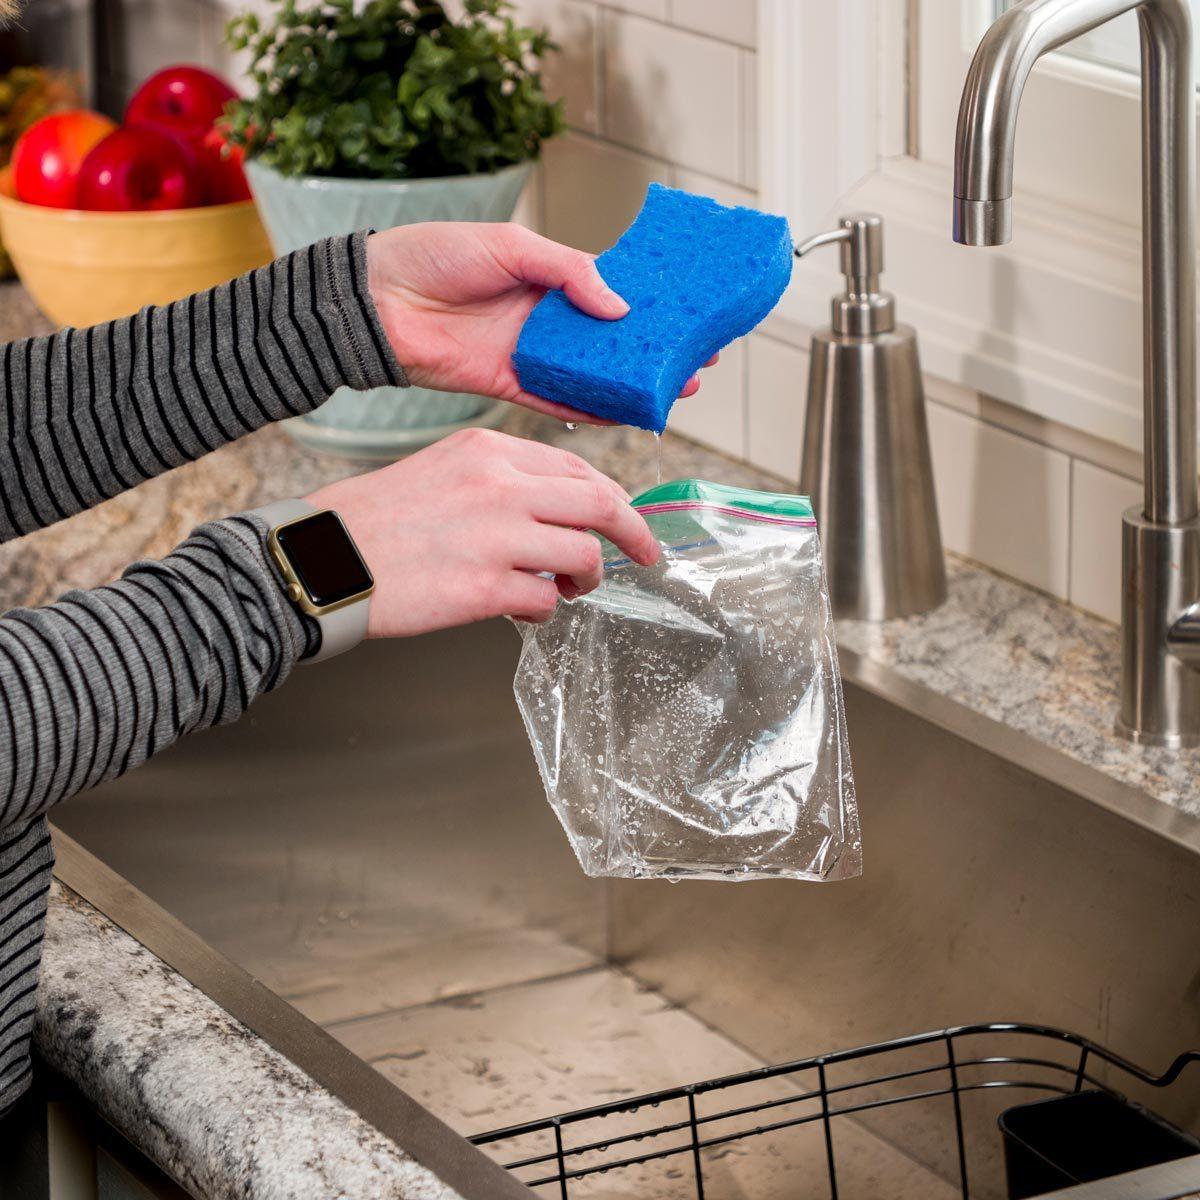 35 Money-Saving Handy Hints Using Everyday Items